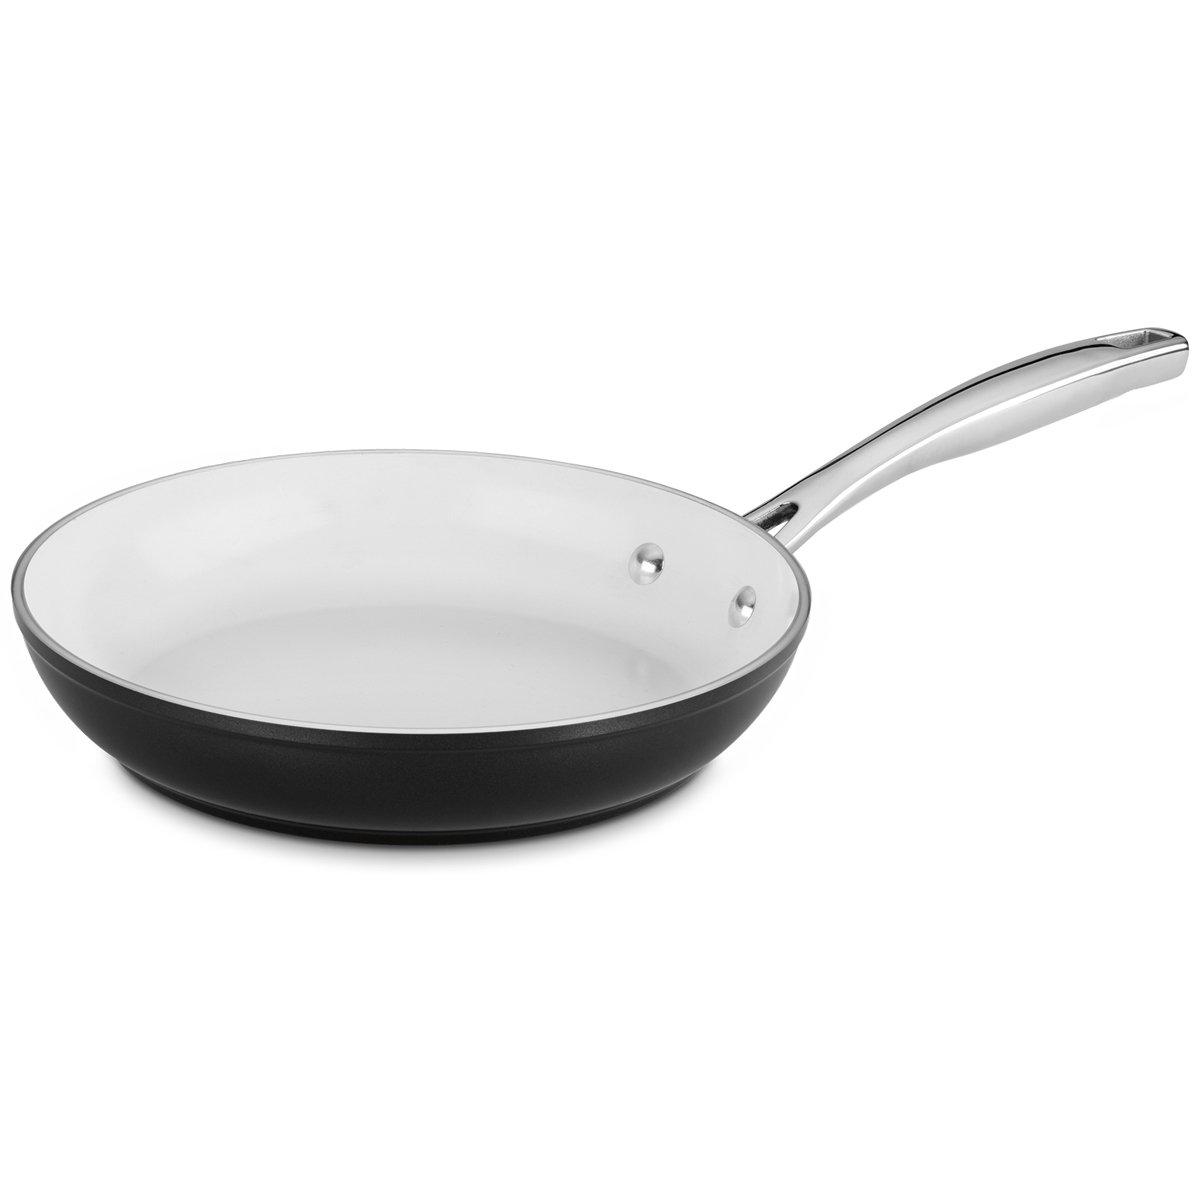 Amazon.com: Cuisinart Elements 10piece Ceramica Polar White Non Stick cookware: Kitchen & Dining